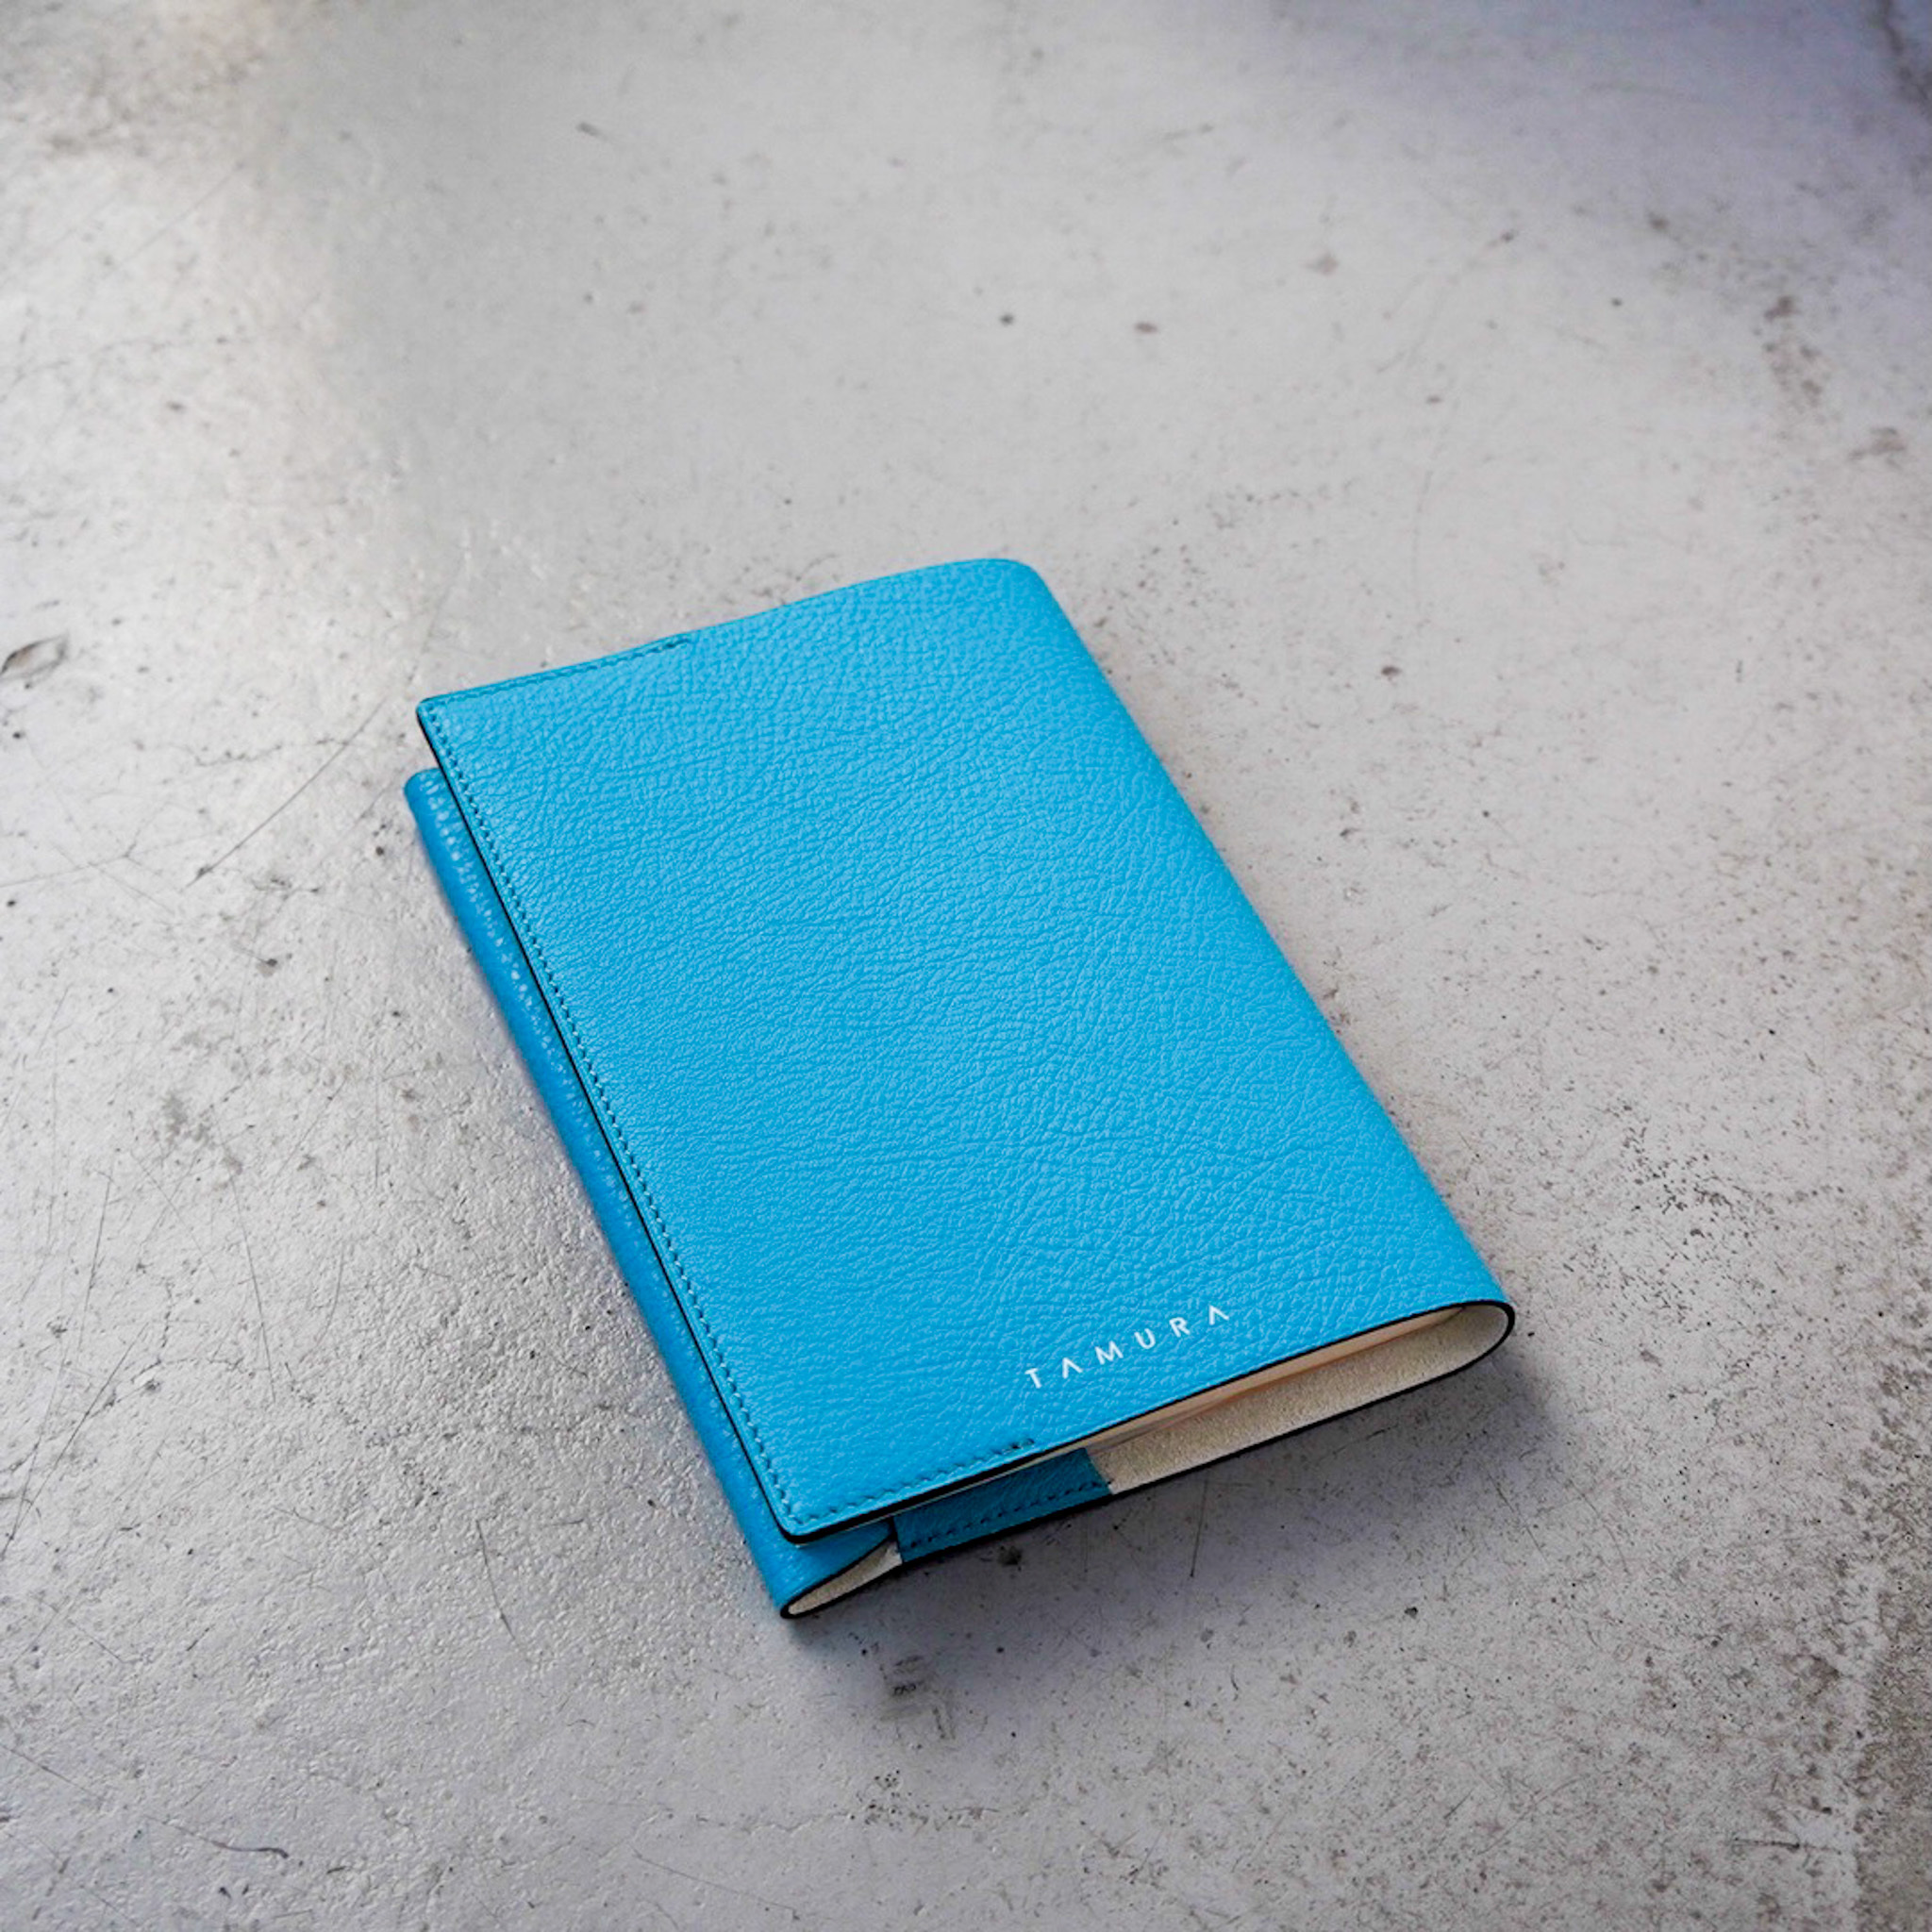 BOOK COVER(文庫サイズ)ライトブルー × アイボリー